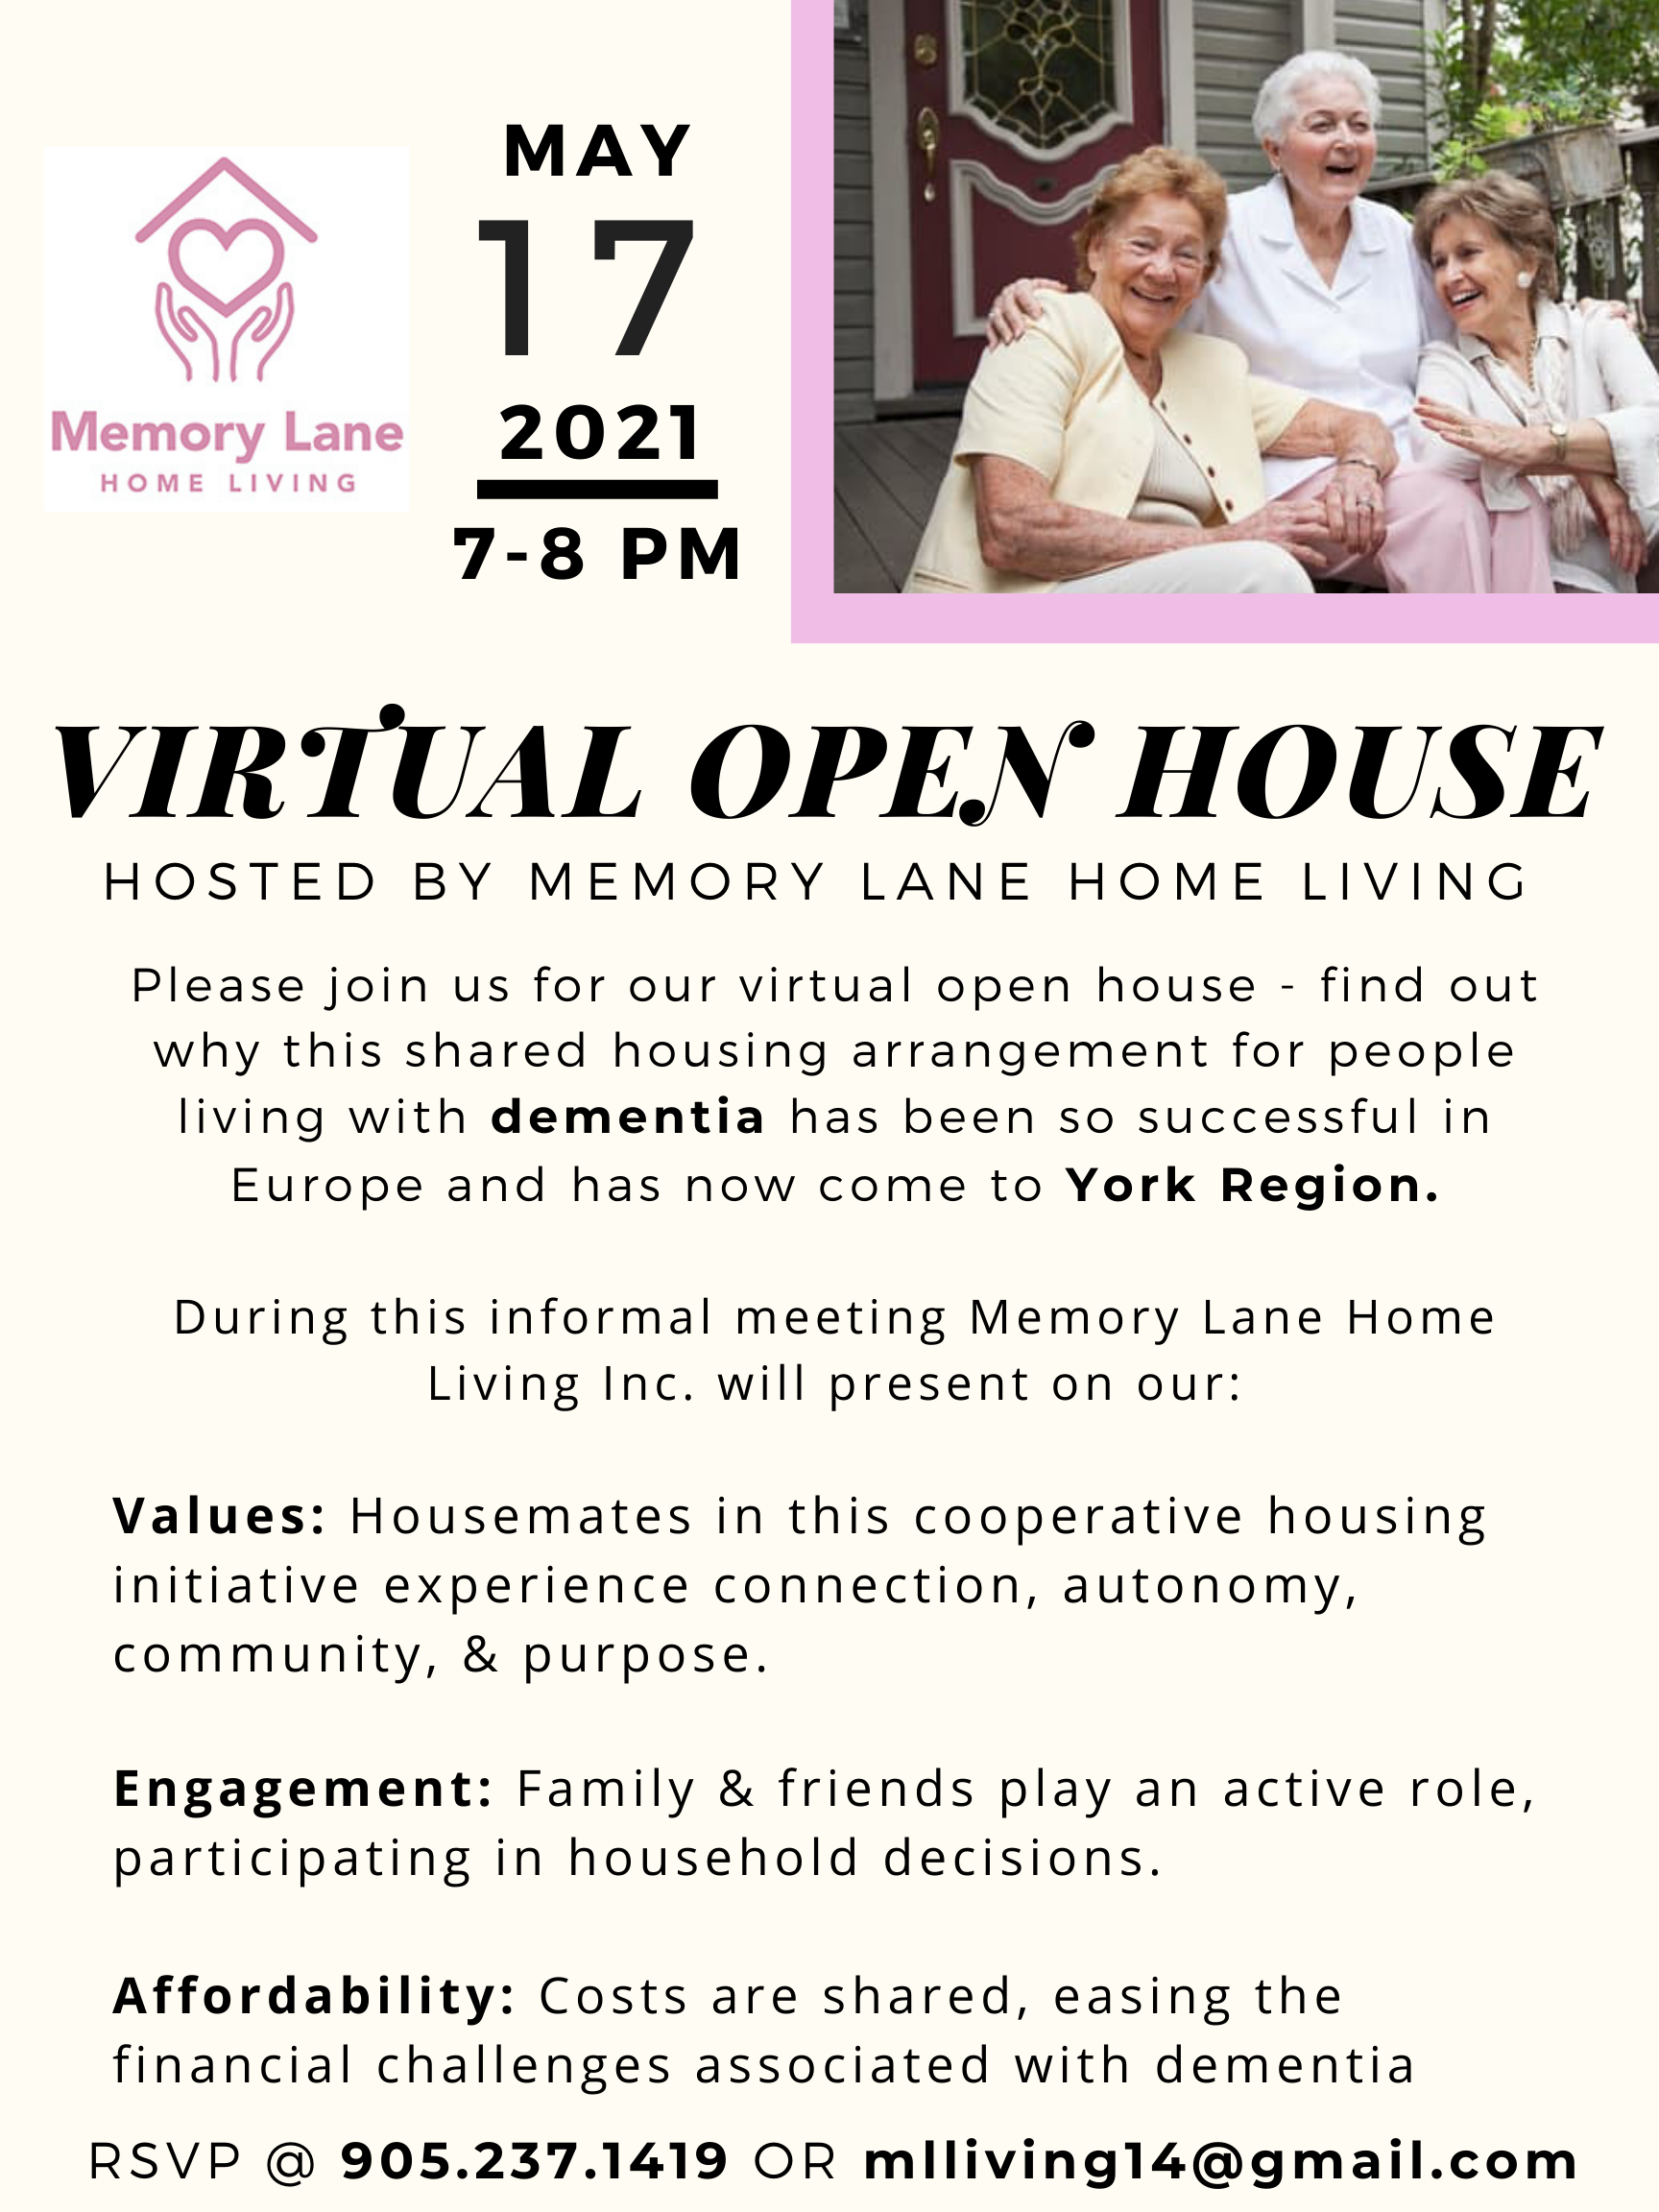 Memory Lane Home Living Inc.